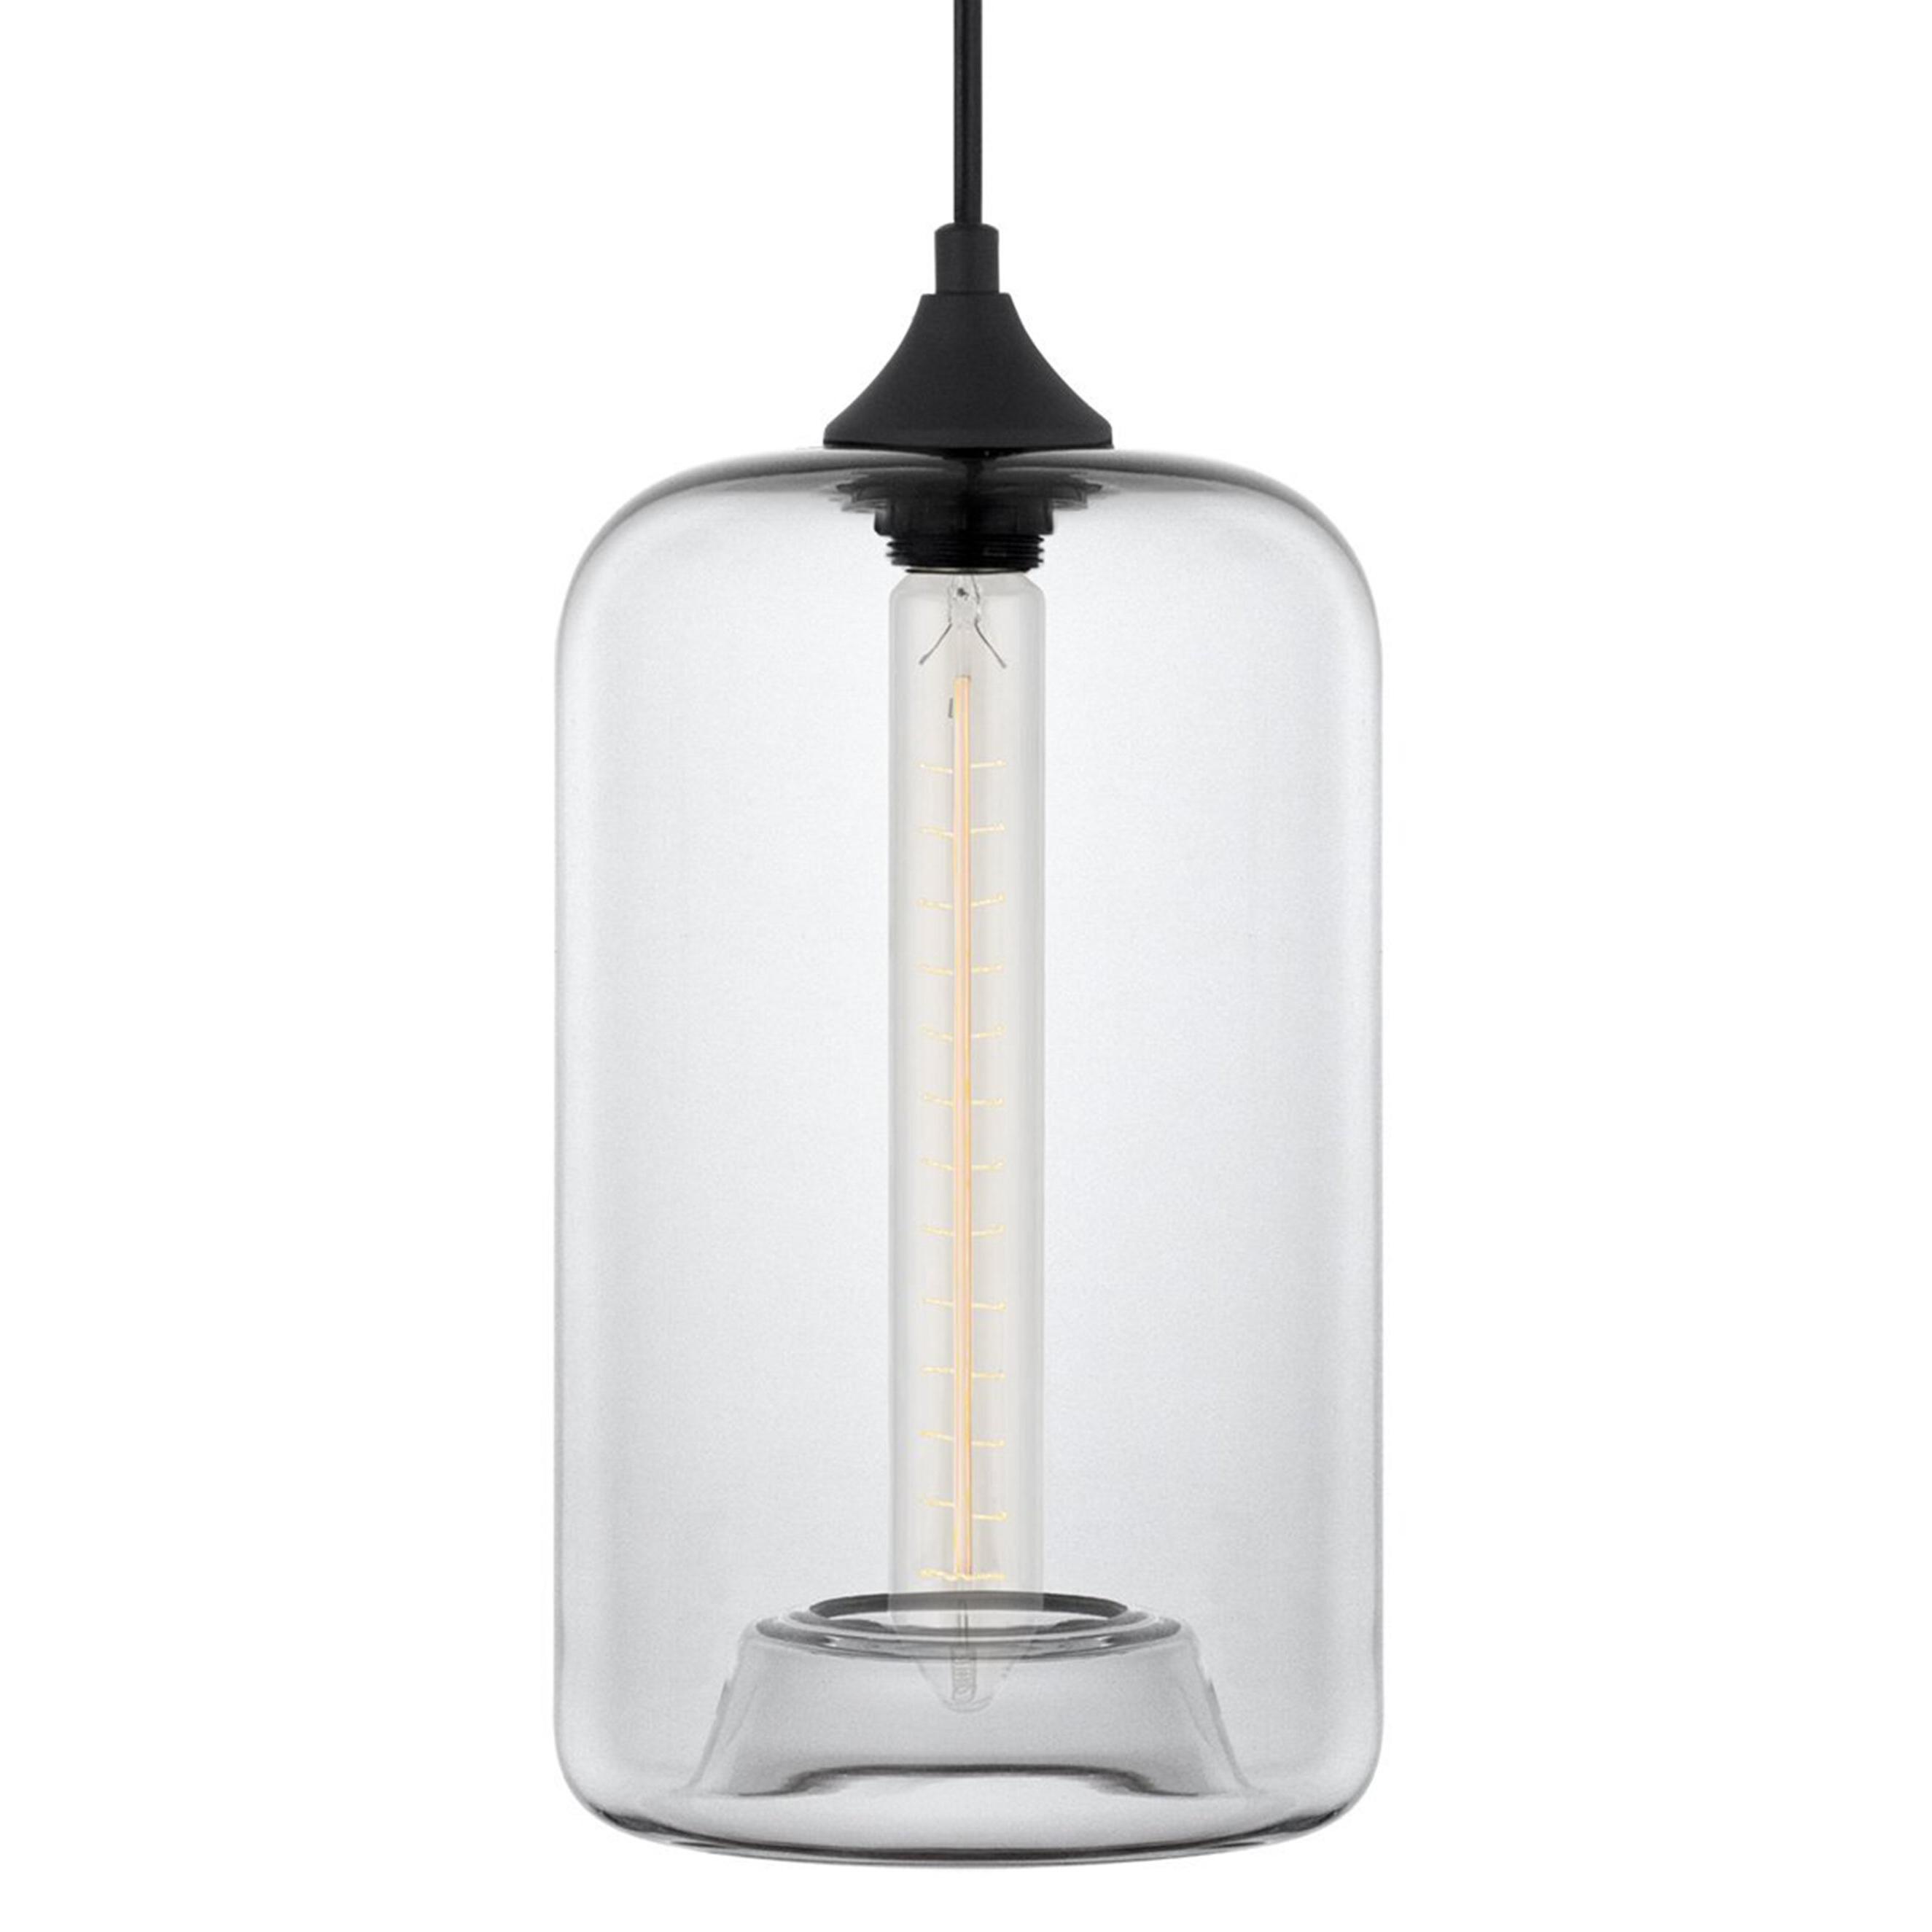 2019 Derek 1 Light Cylinder Pendant In Scruggs 1 Light Geometric Pendants (View 19 of 25)